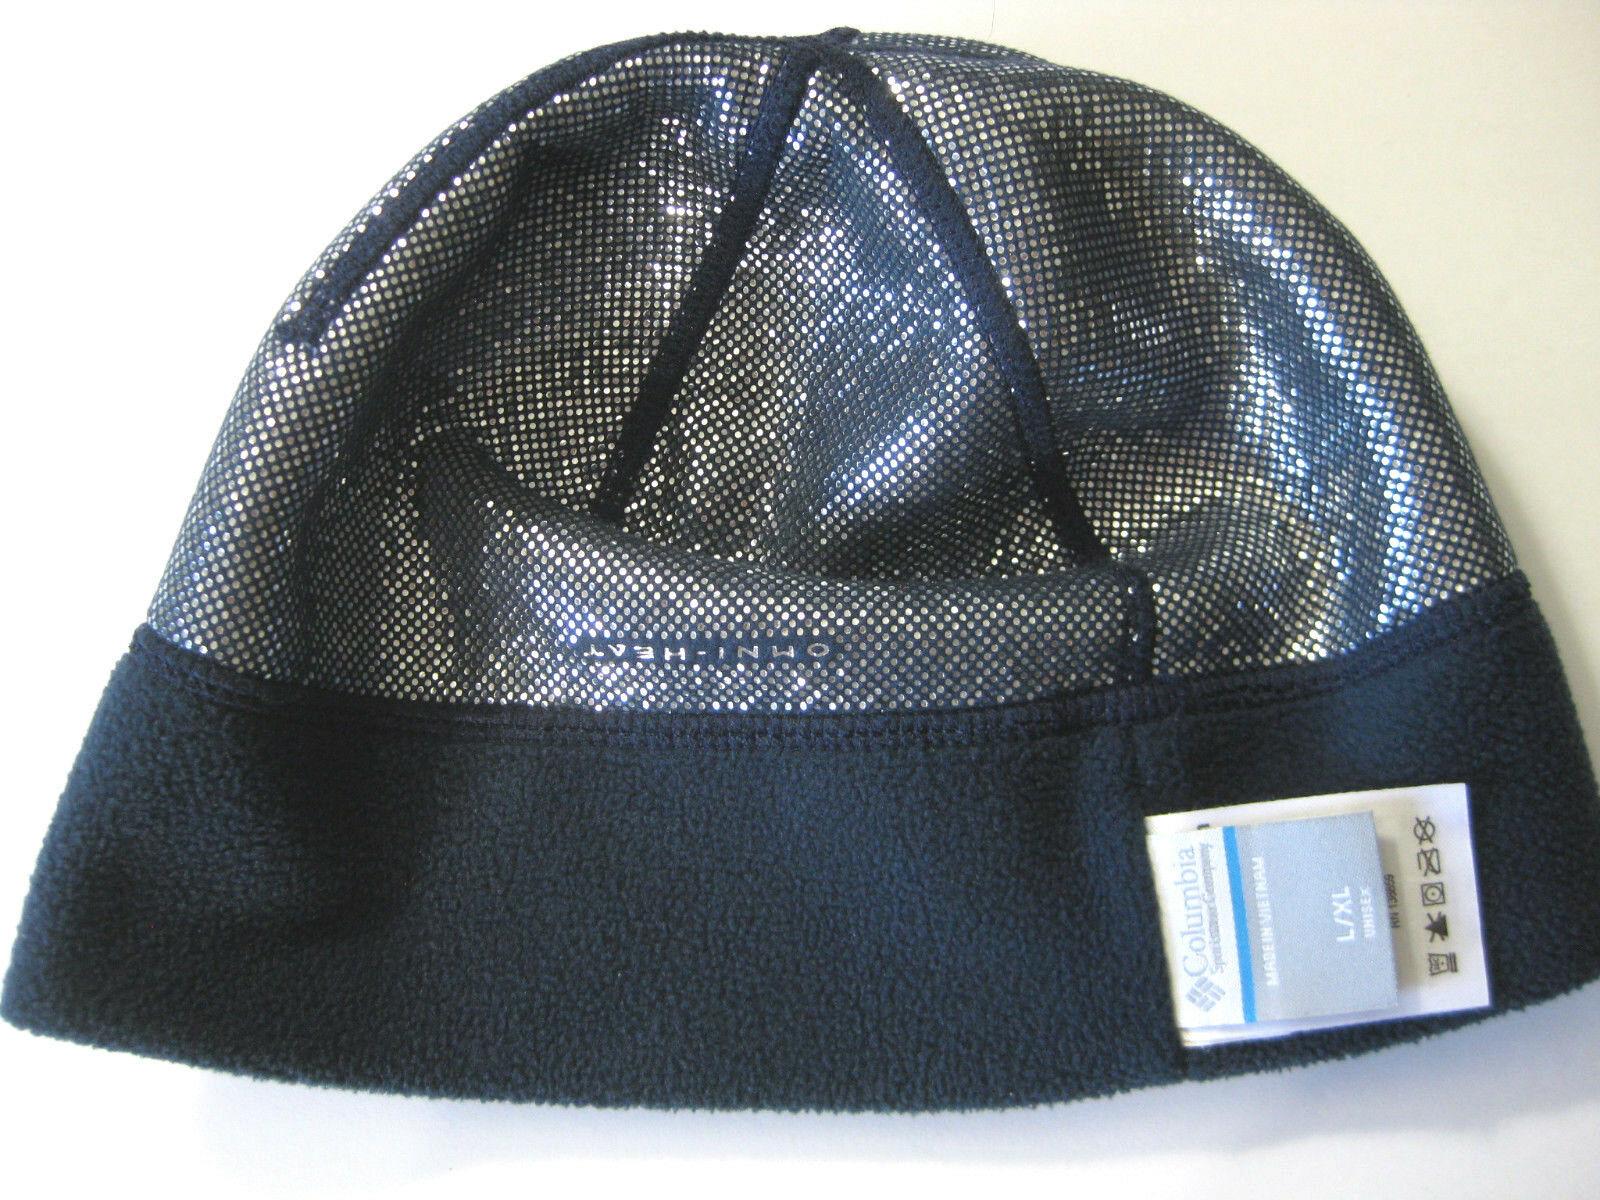 678e41dbc6c84 Regis Columbia Beanie Hat Navy Omni-Heat Very Warm Unisex L XL